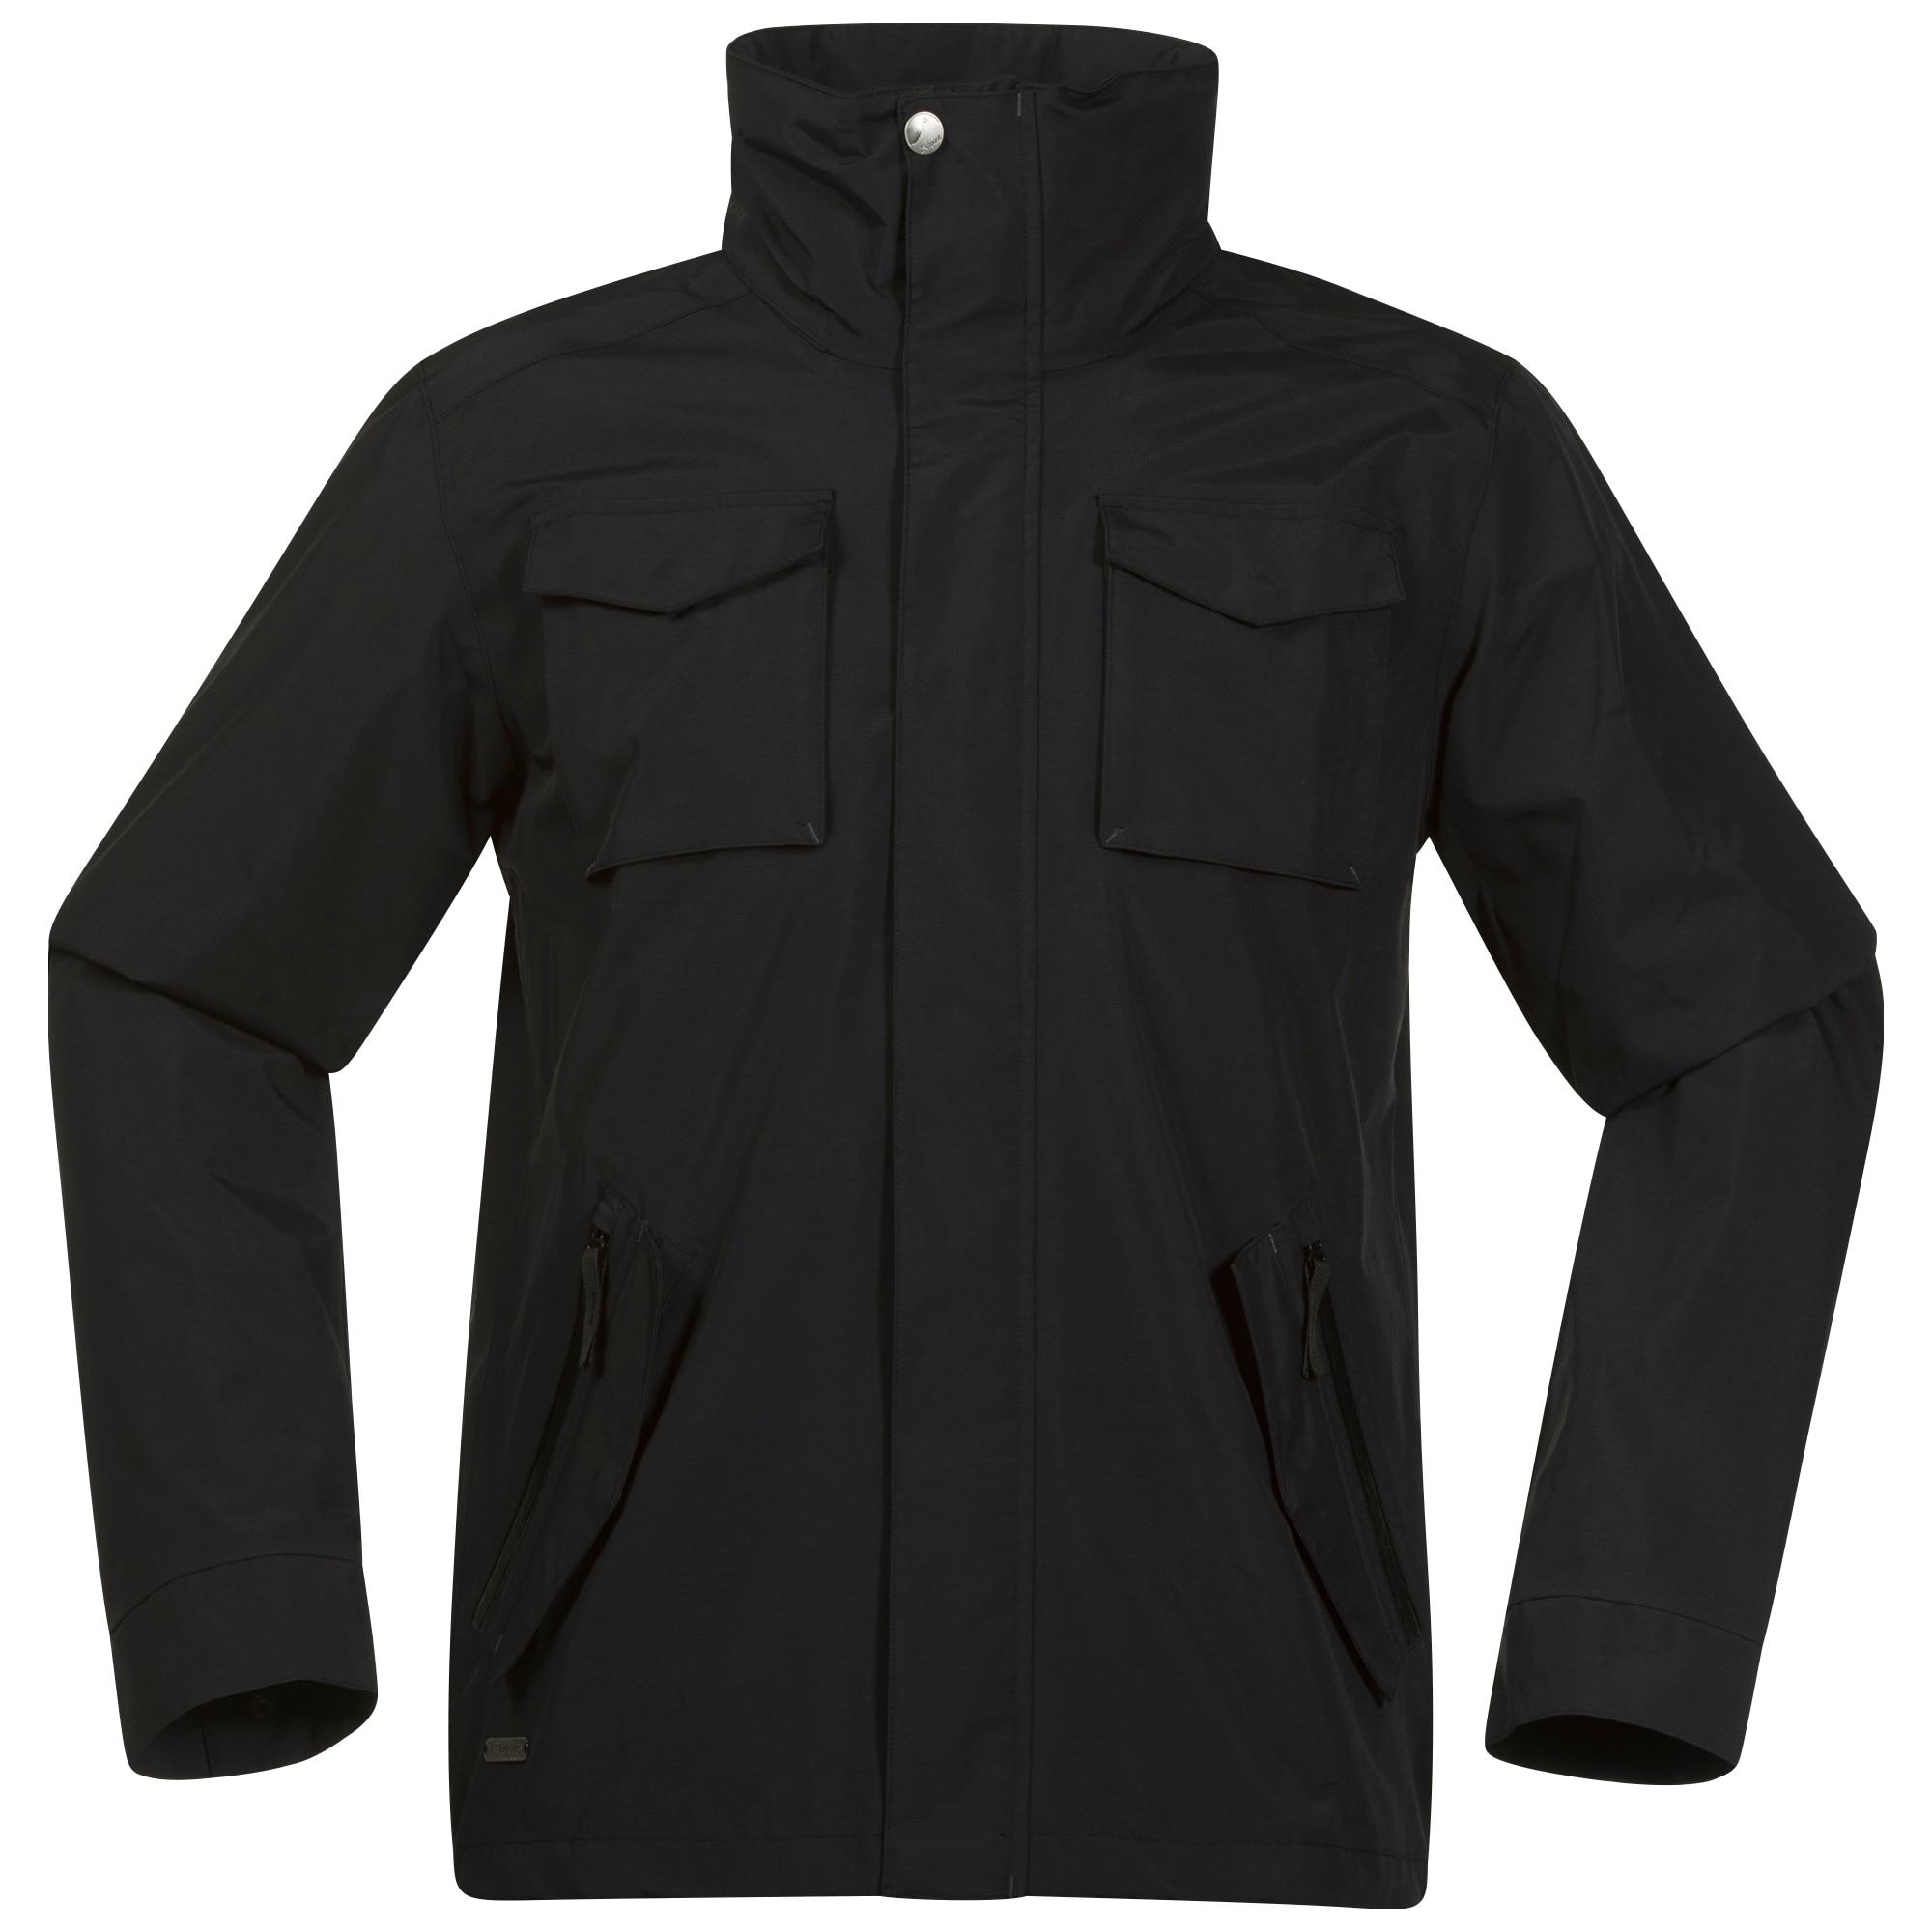 Kil Jacket